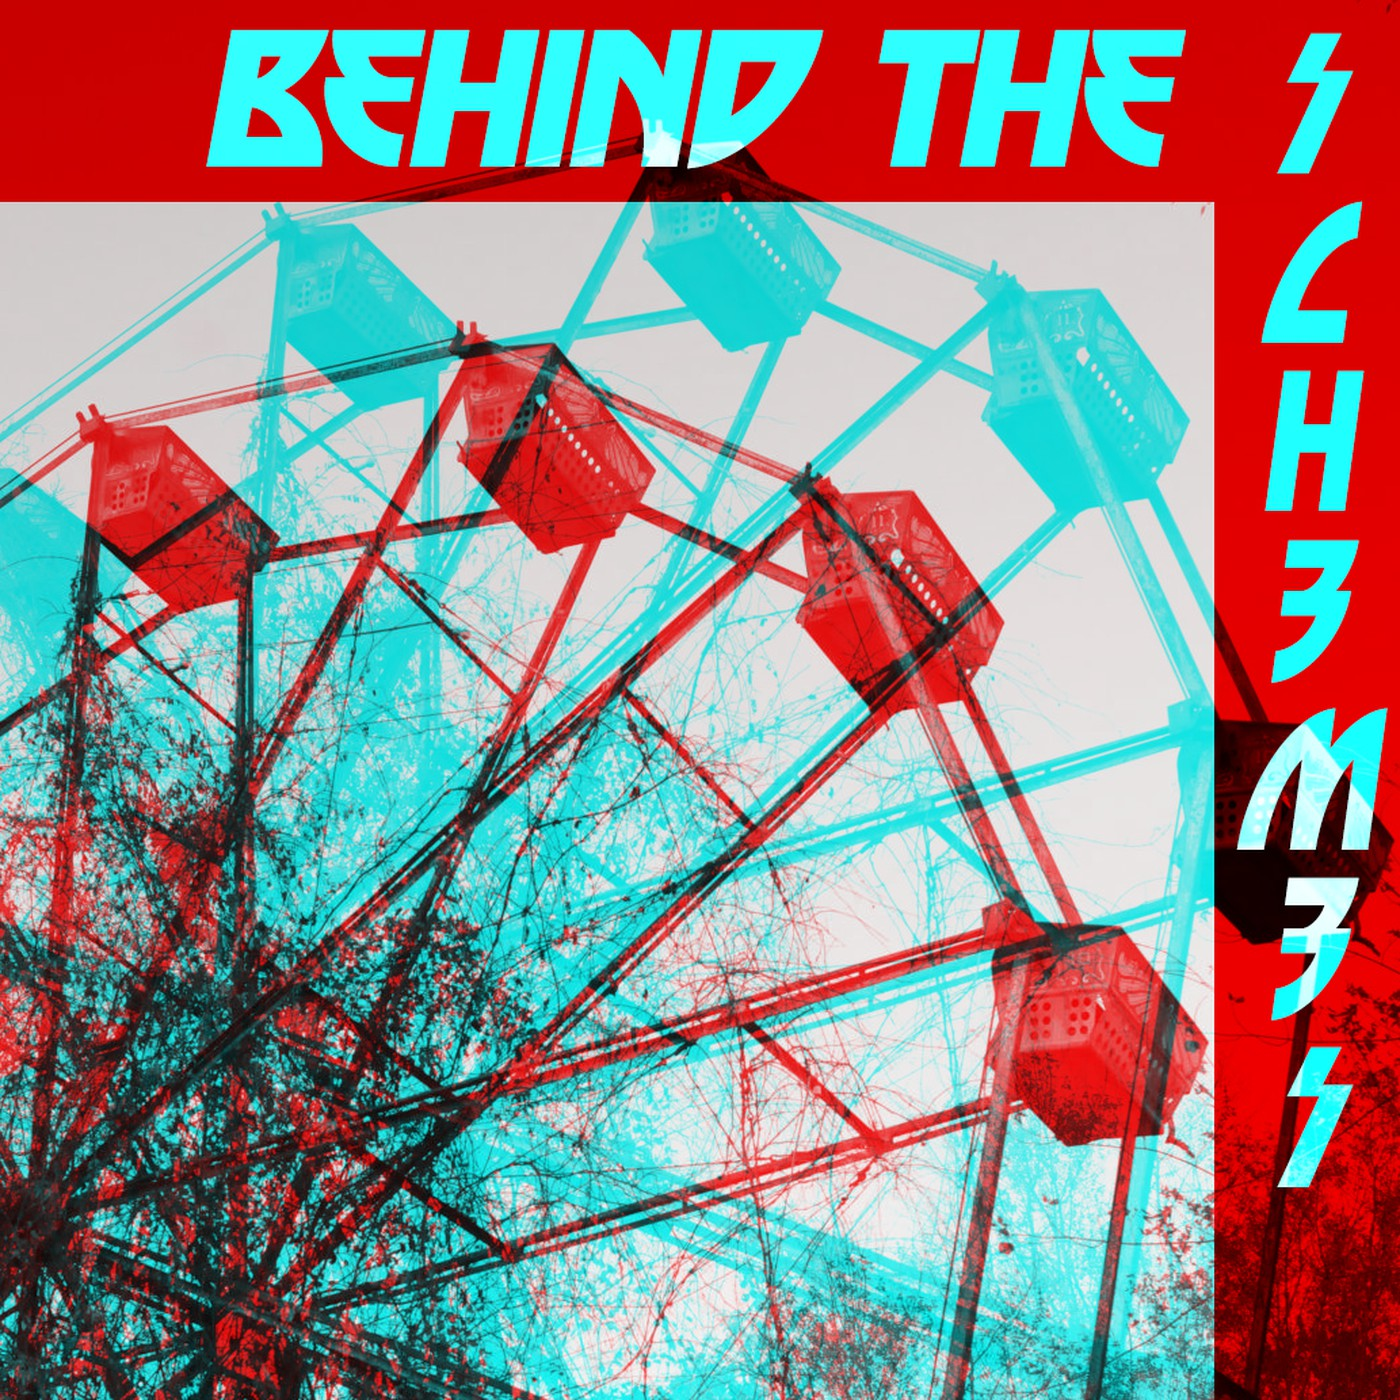 Behind the SchƎmƎs